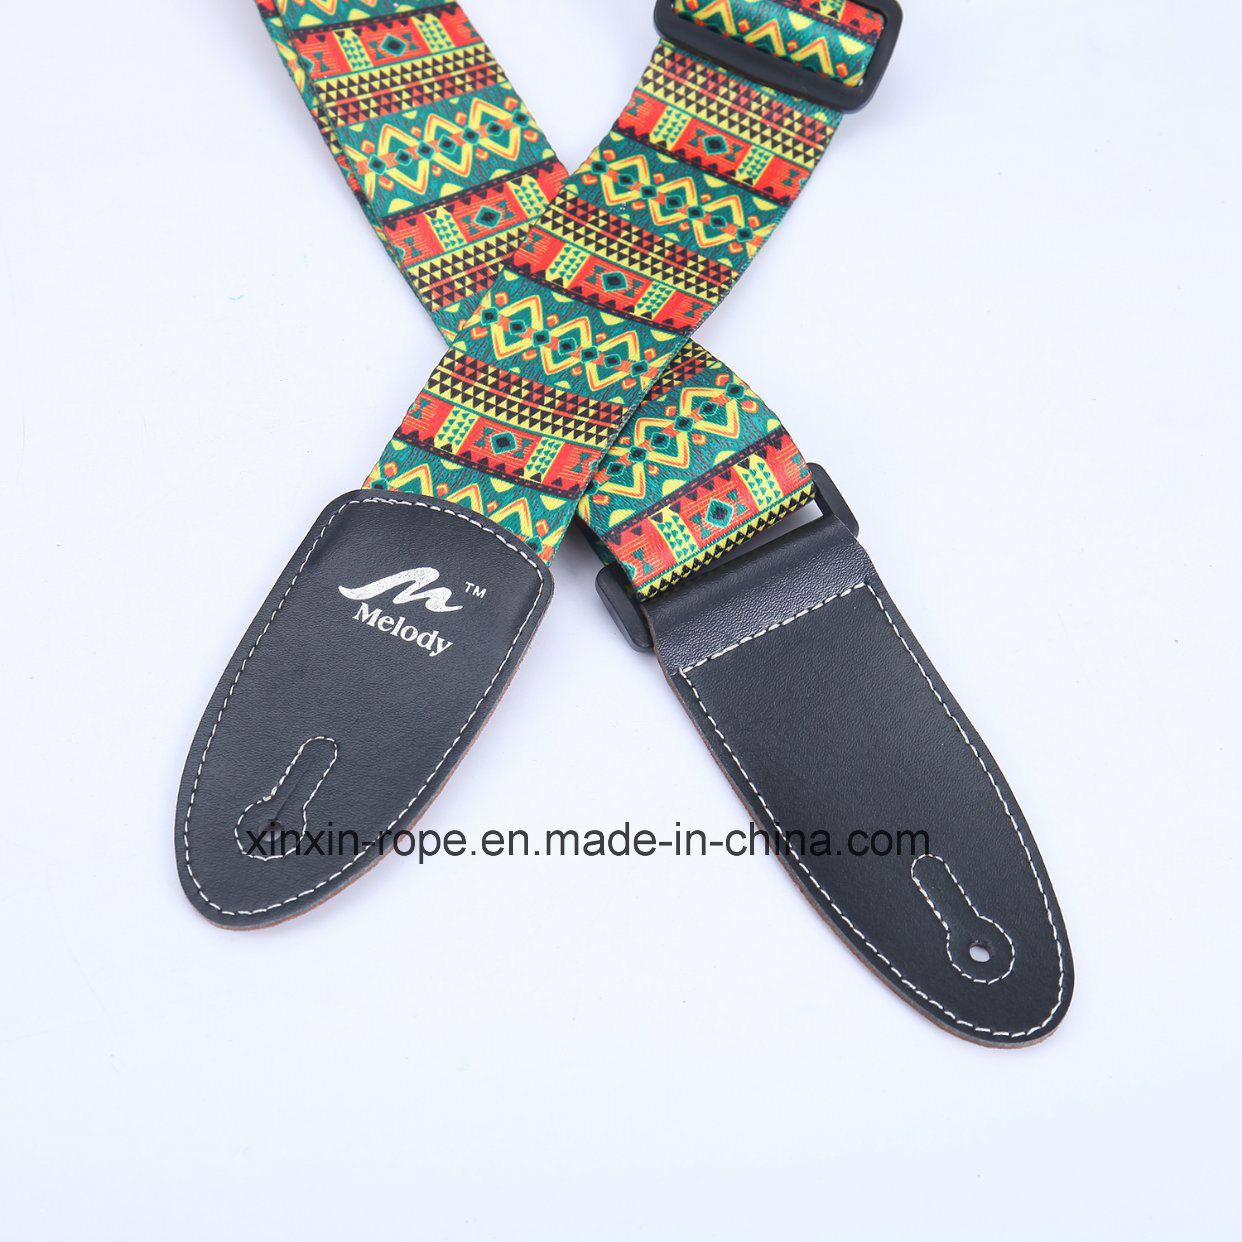 Fashion Jacquard PU Leather Webbing Belt for Guitar